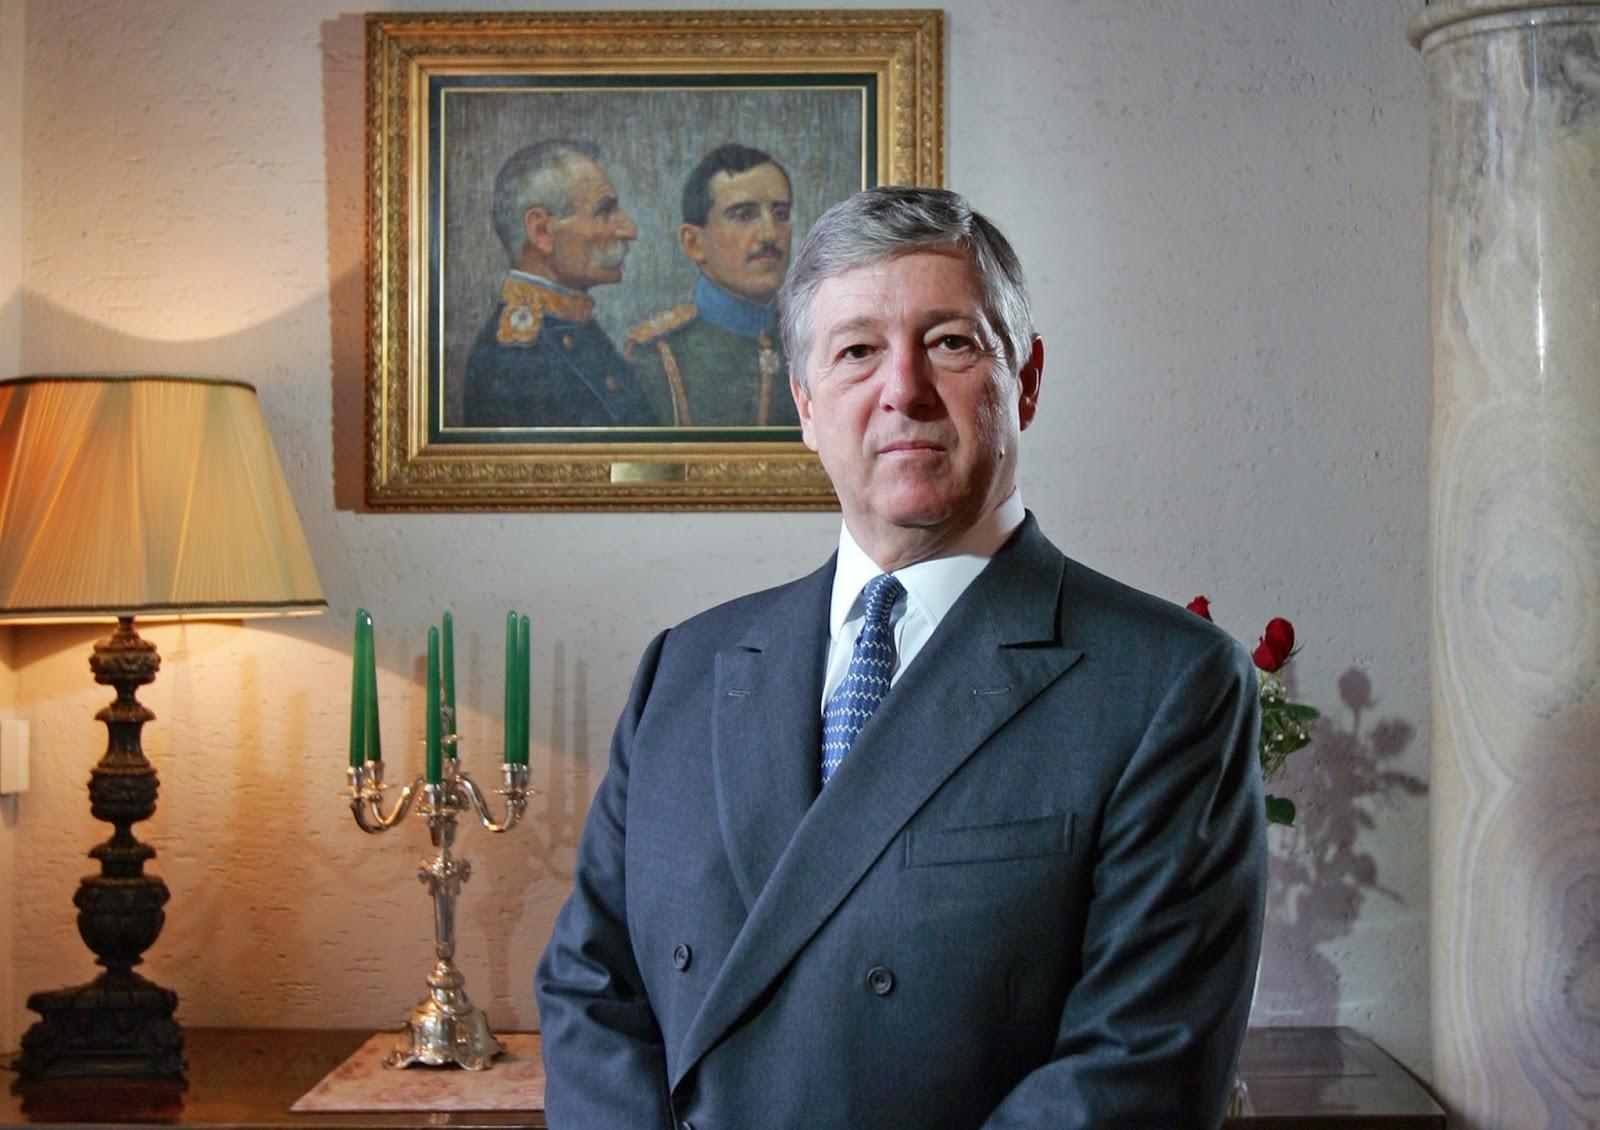 Prince Alexandre de Serbie